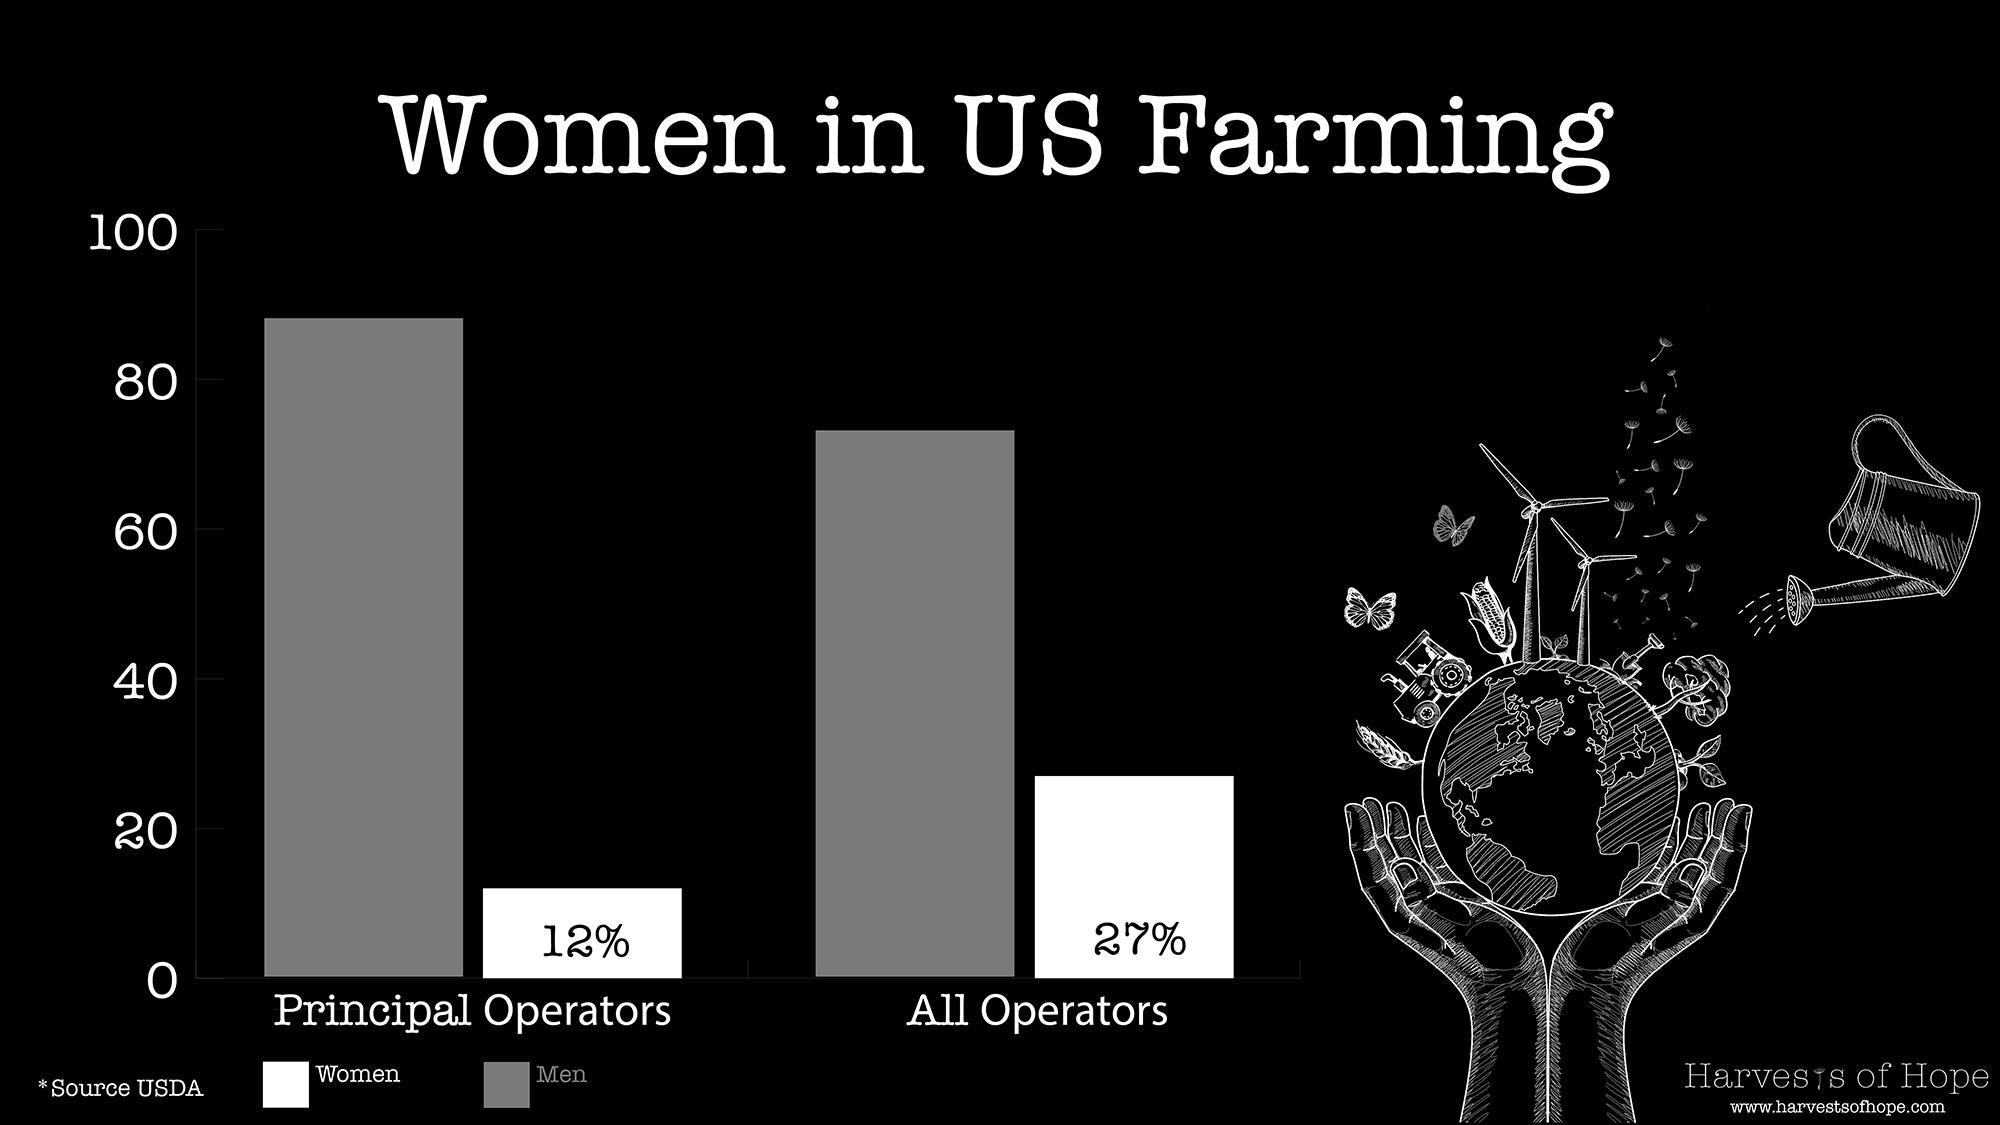 Women in US farming statistics